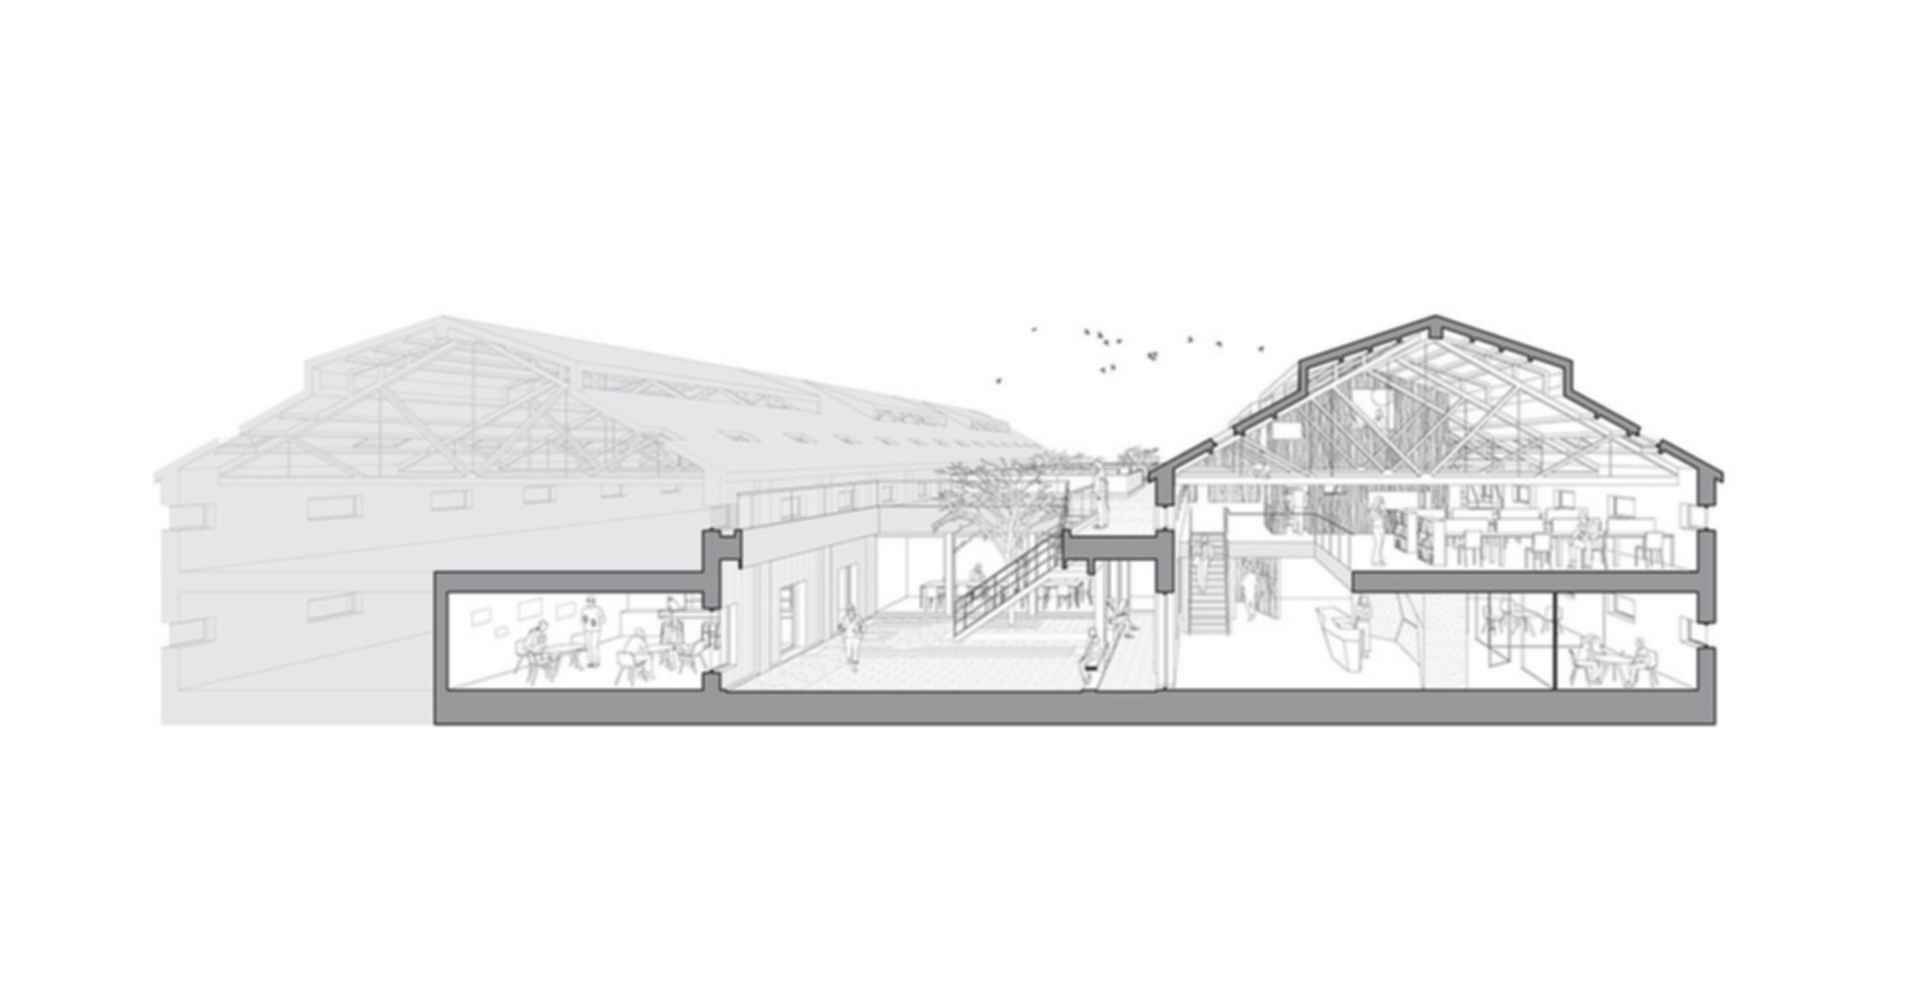 Arrow Factory: Hutong Media & Culture Creative Space - concept design